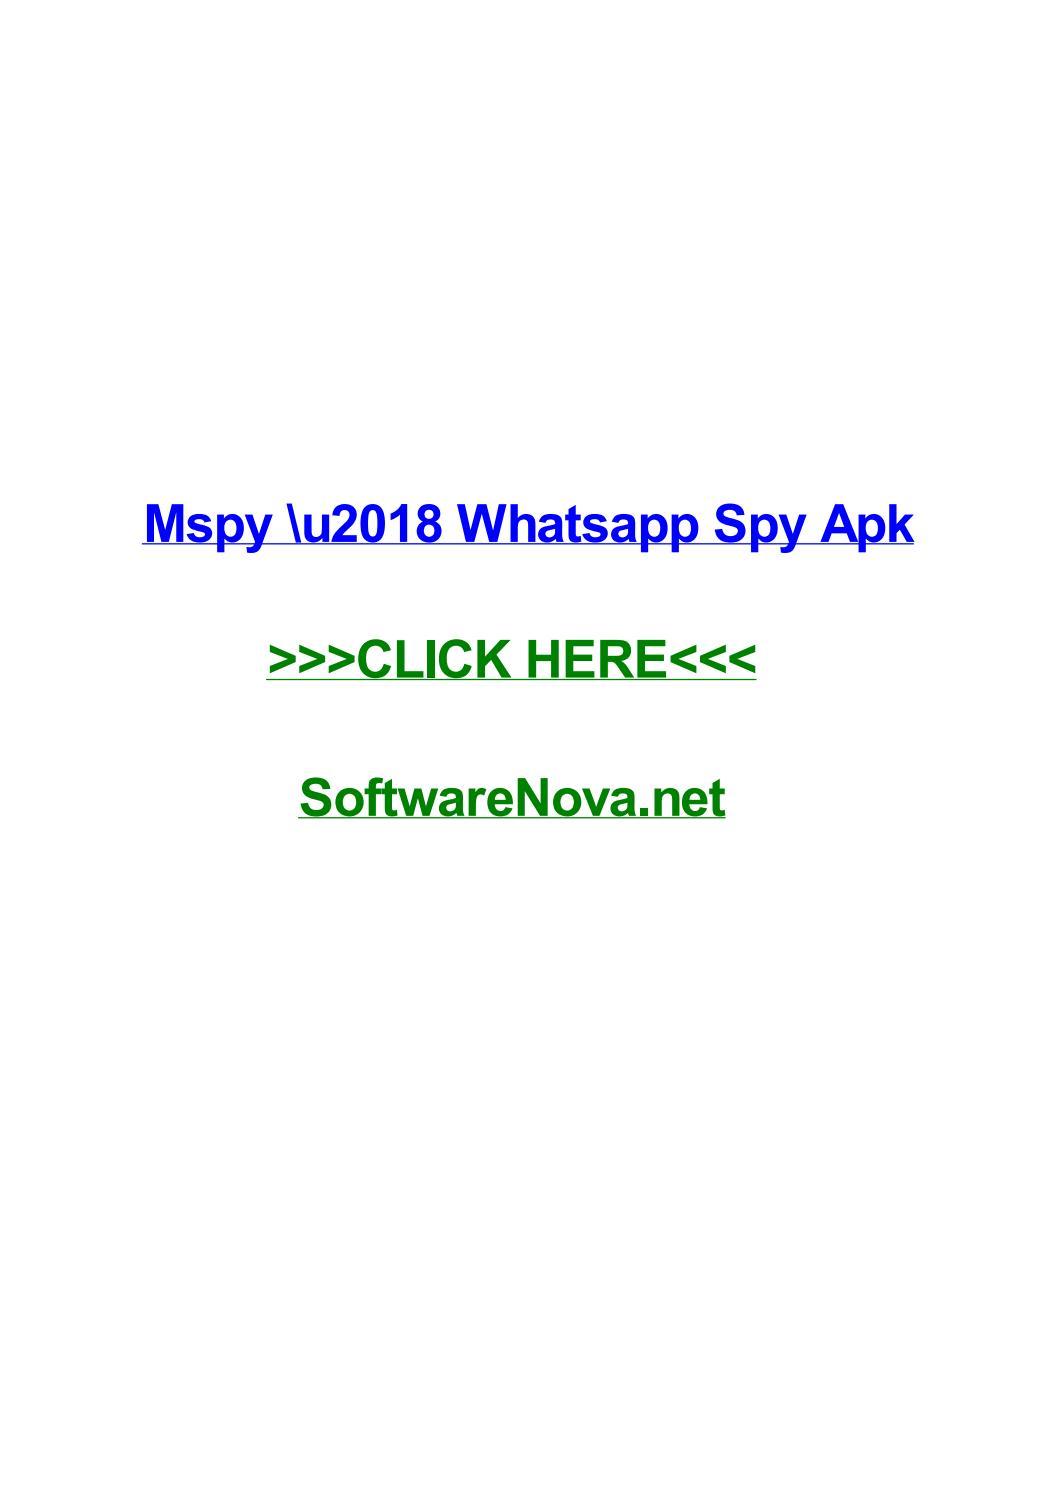 baixar mspy para android gratis